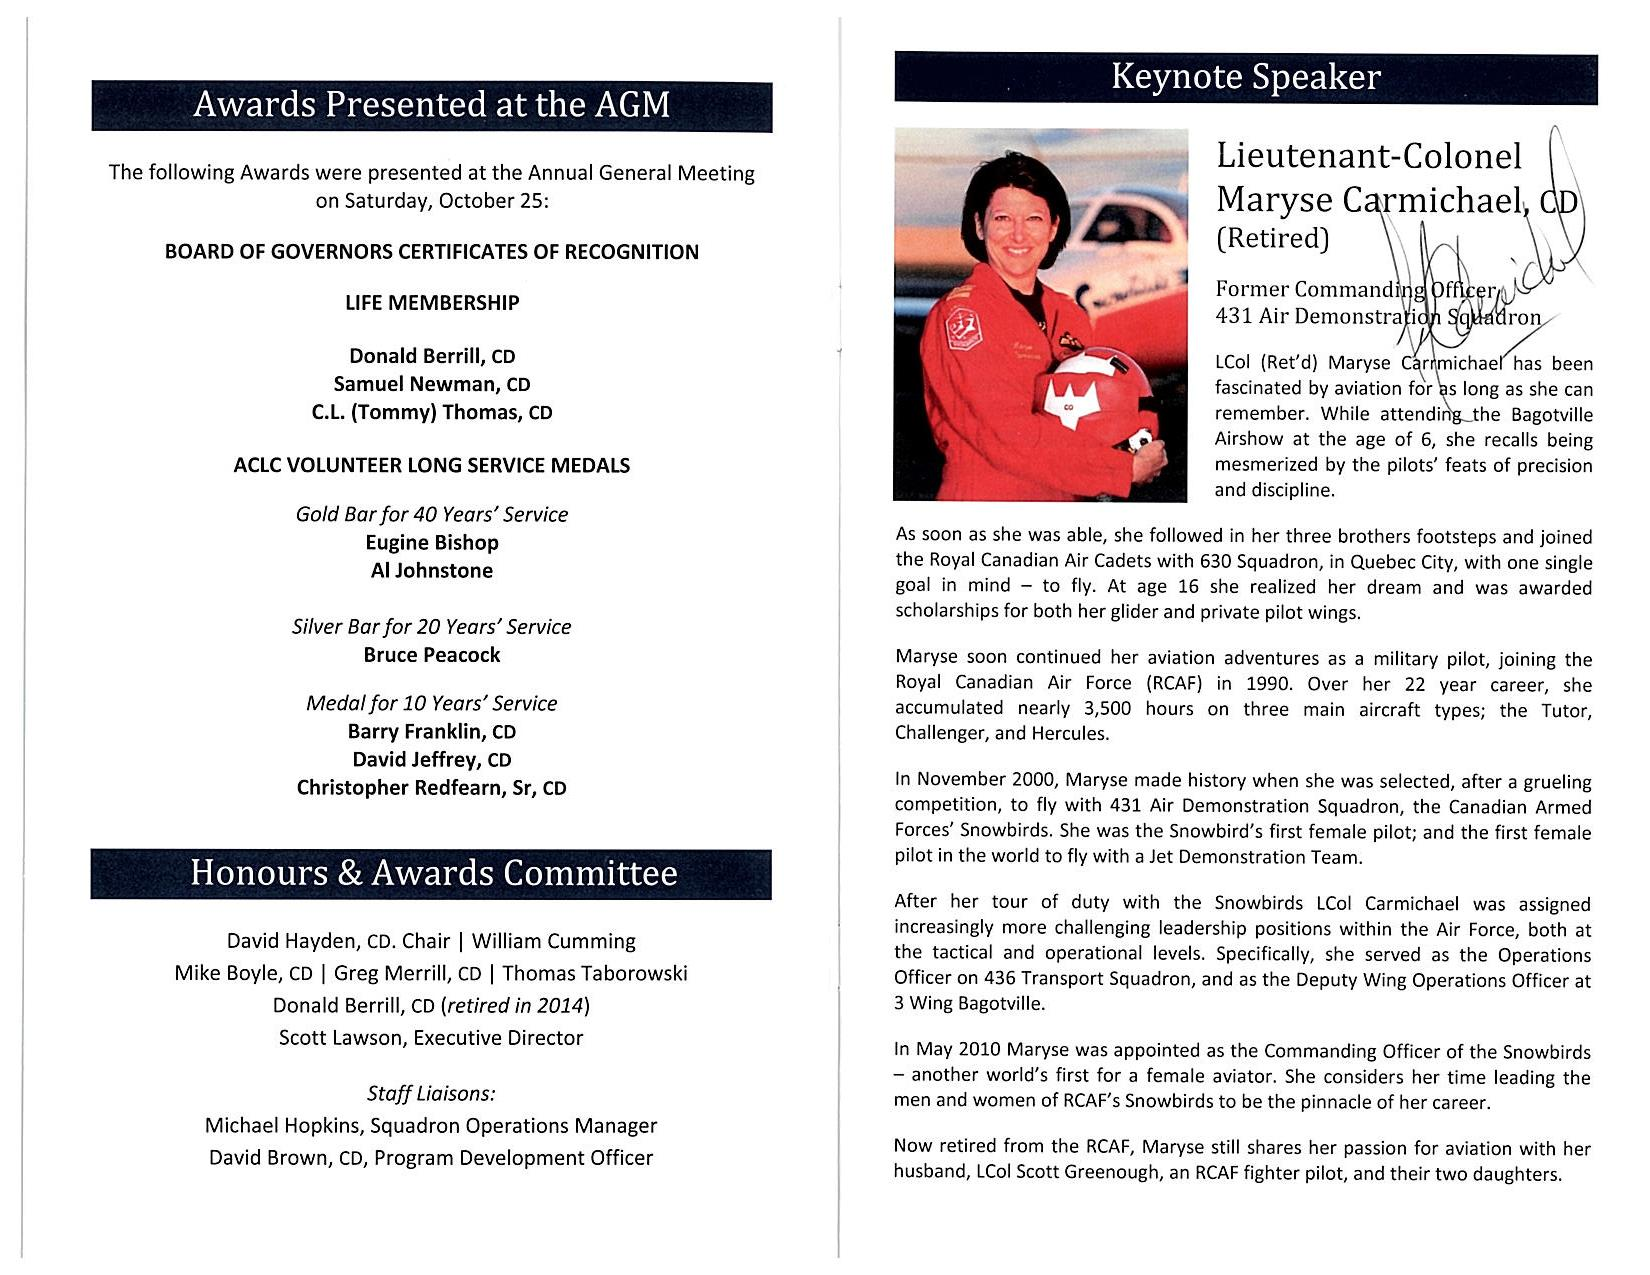 Awards Program page 2 signed by Keynote Speaker 2014.jpg